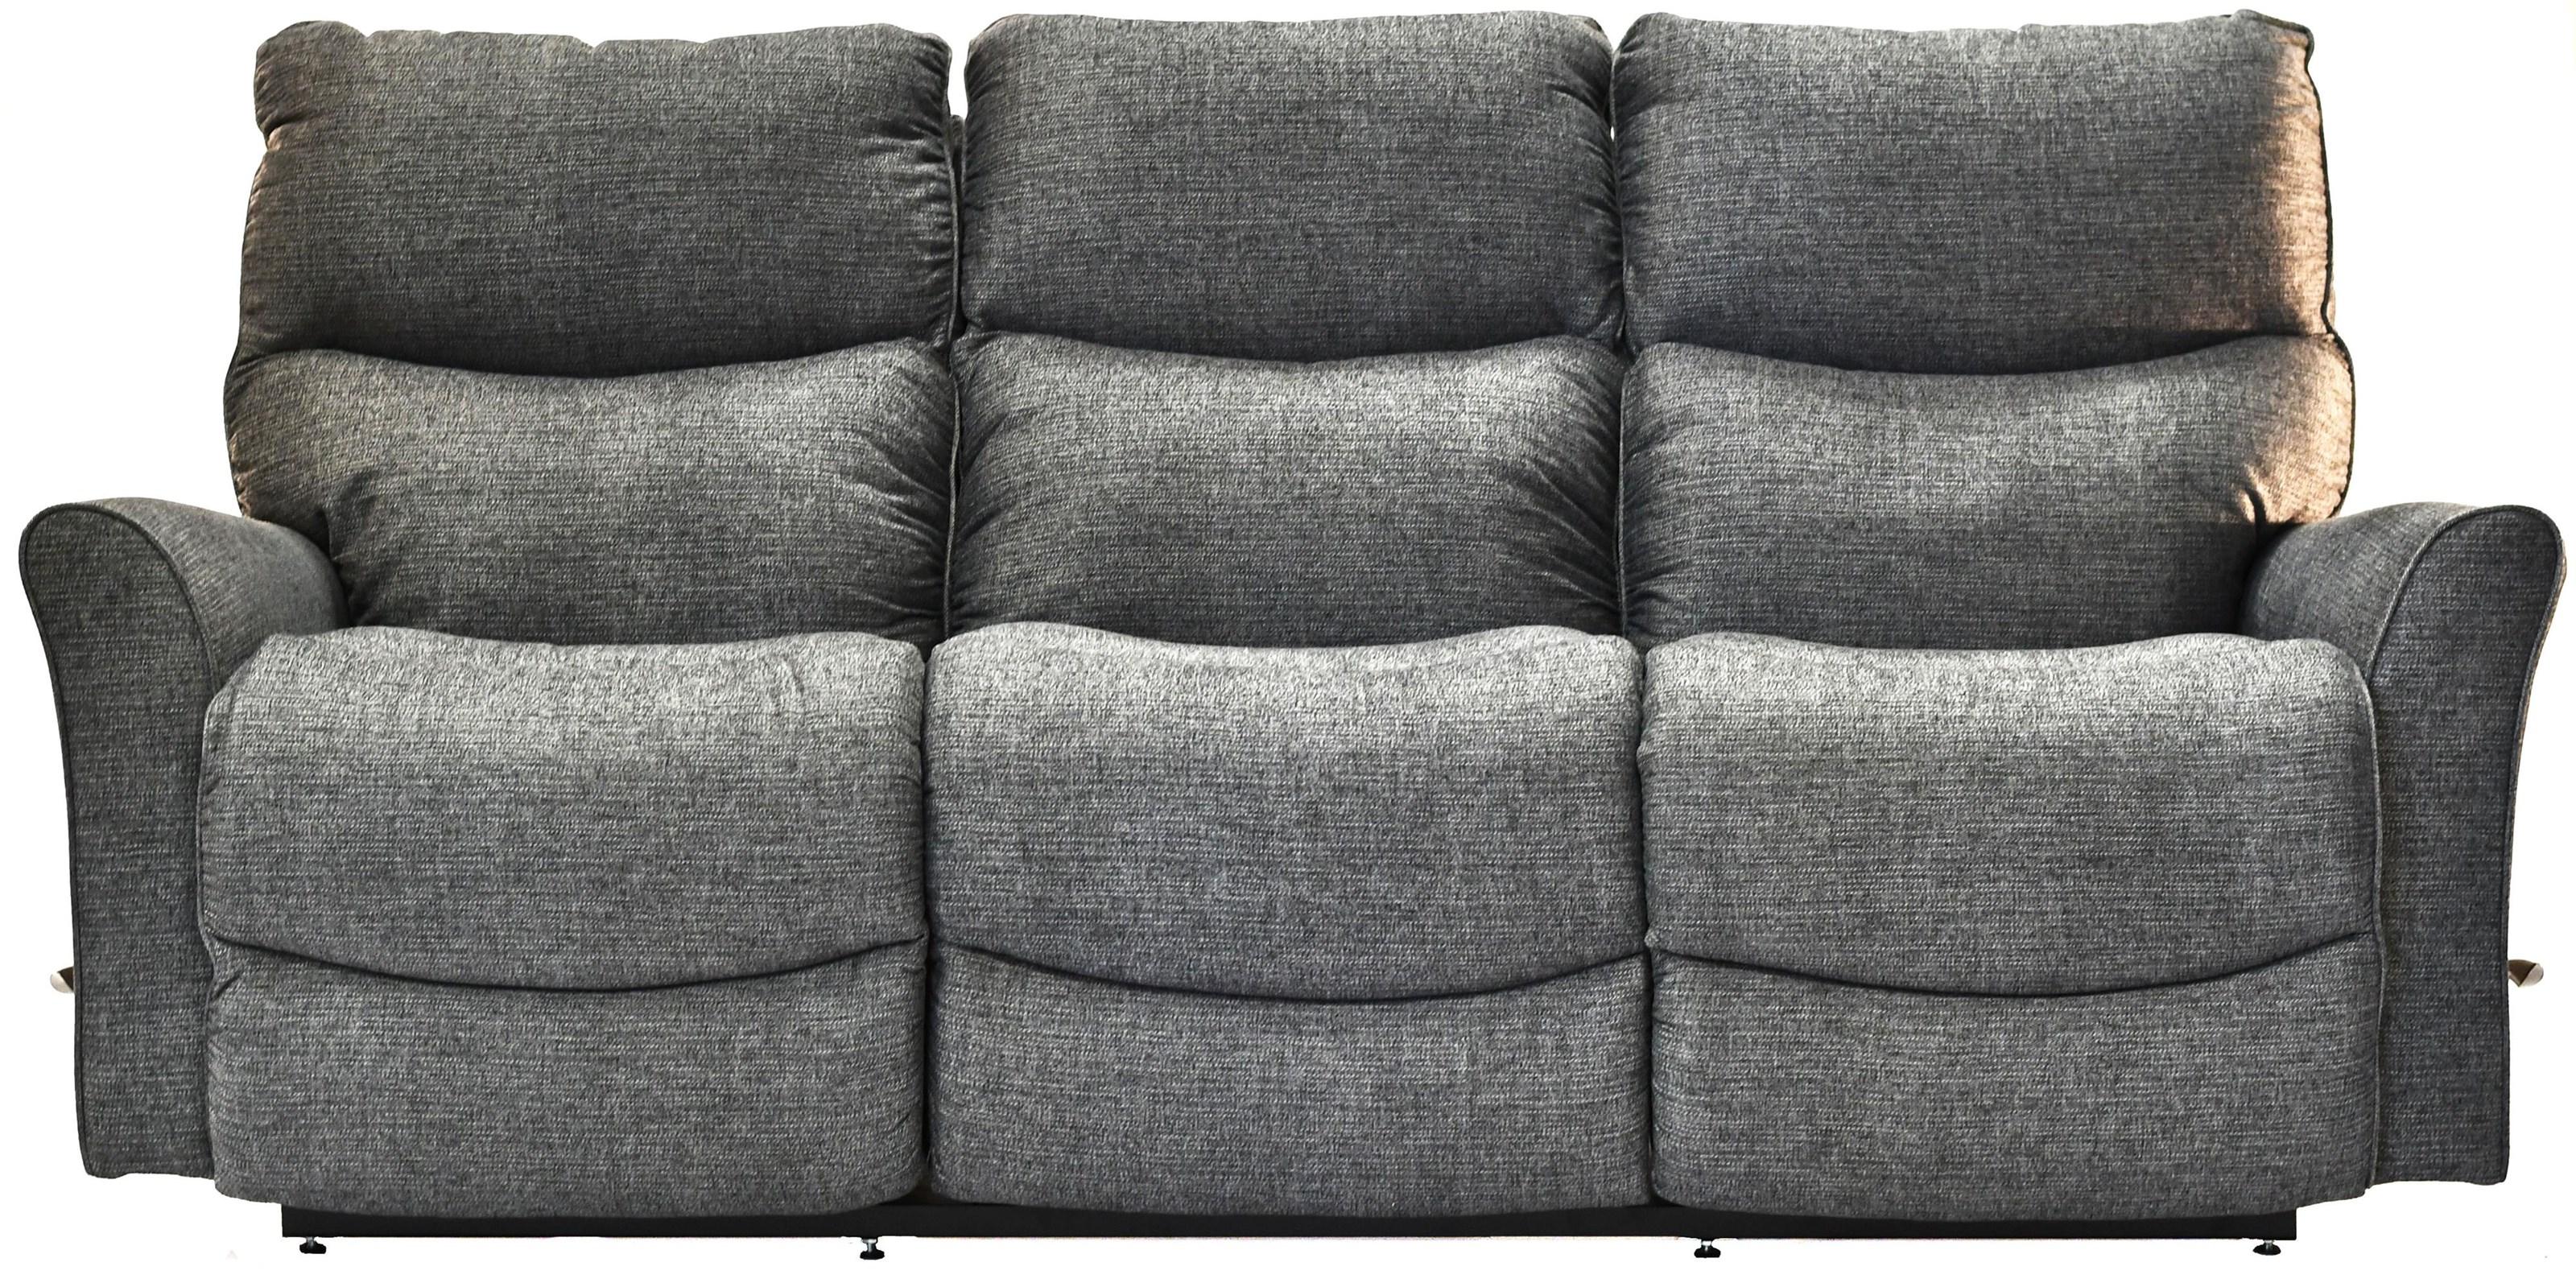 Rowan Reclina-Way® Full Reclining Sofa by La-Z-Boy at Bennett's Furniture and Mattresses